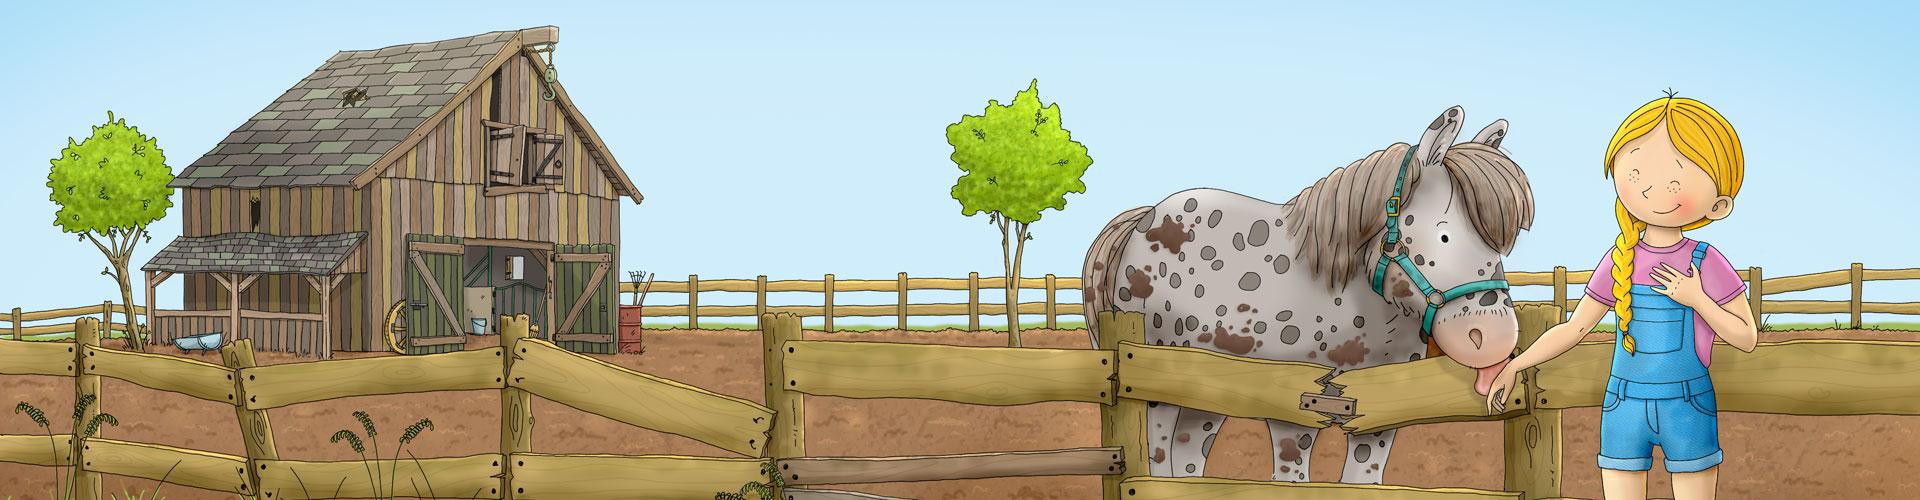 Stip-Pony-op-avontuur_Nick-Driessen